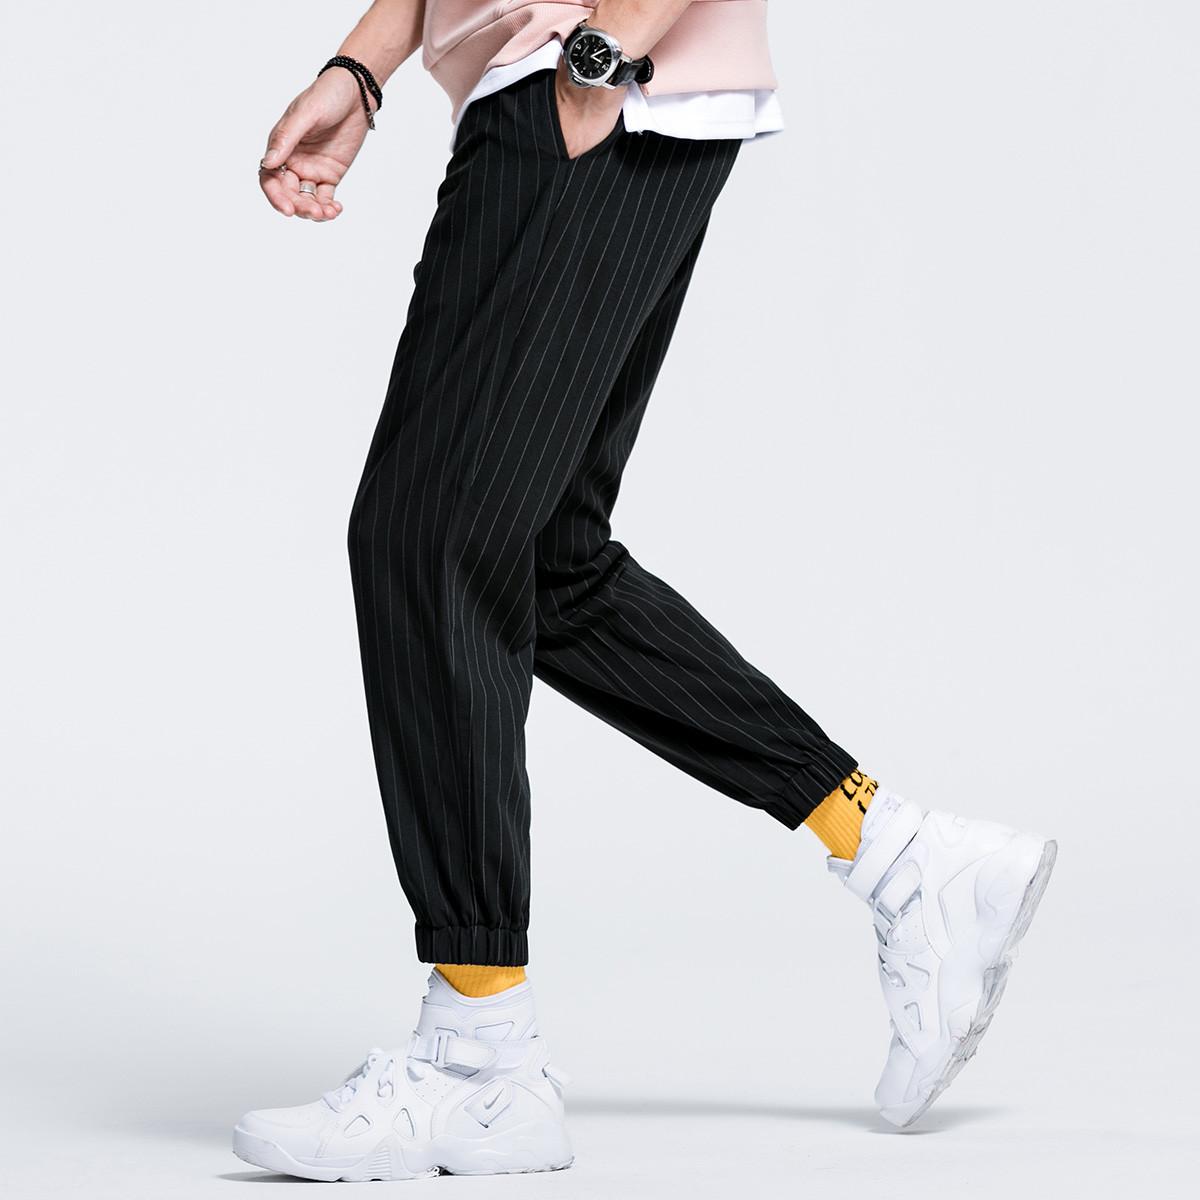 KM KILO KMMETERS2019秋季新品条纹小脚裤时尚休闲简约舒适男士休闲裤K648J23077149